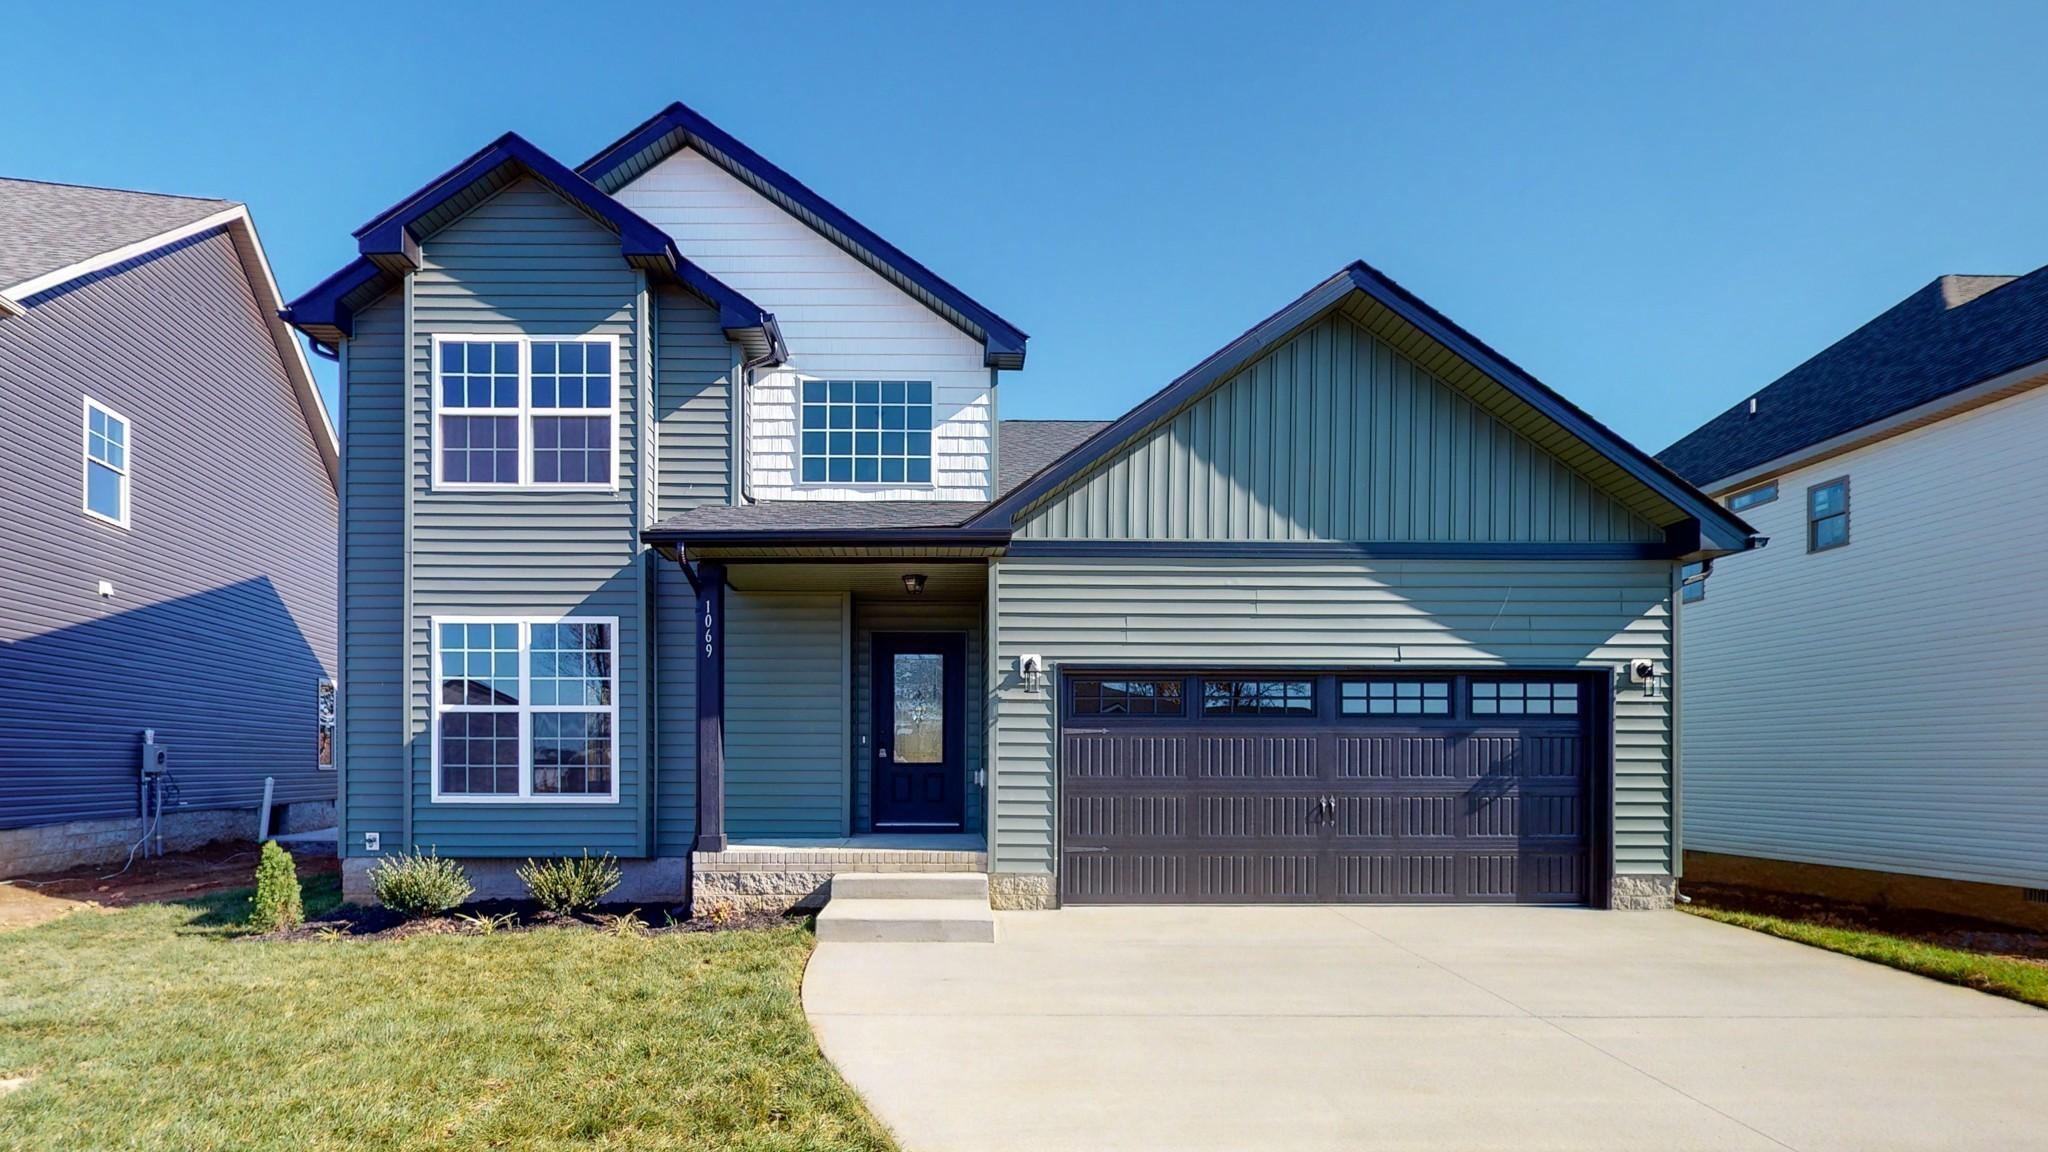 28 Woodall Property Photo - Trenton, KY real estate listing